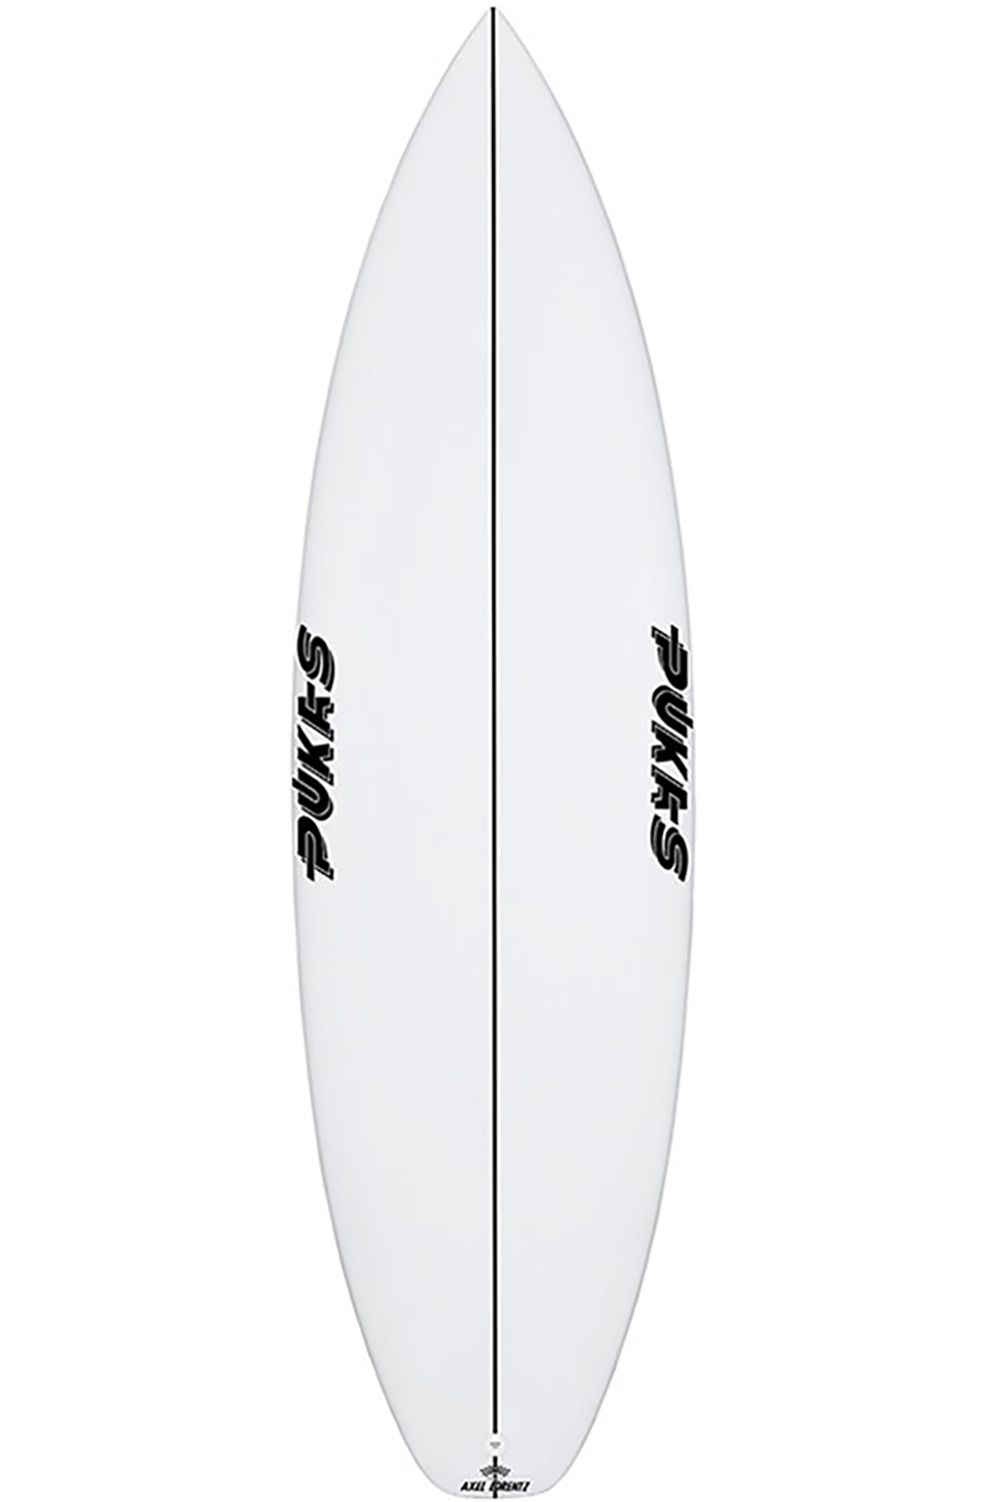 Pukas Surf Board 5'6 TASTY TREAT Squash Tail - White FCS II 5ft6